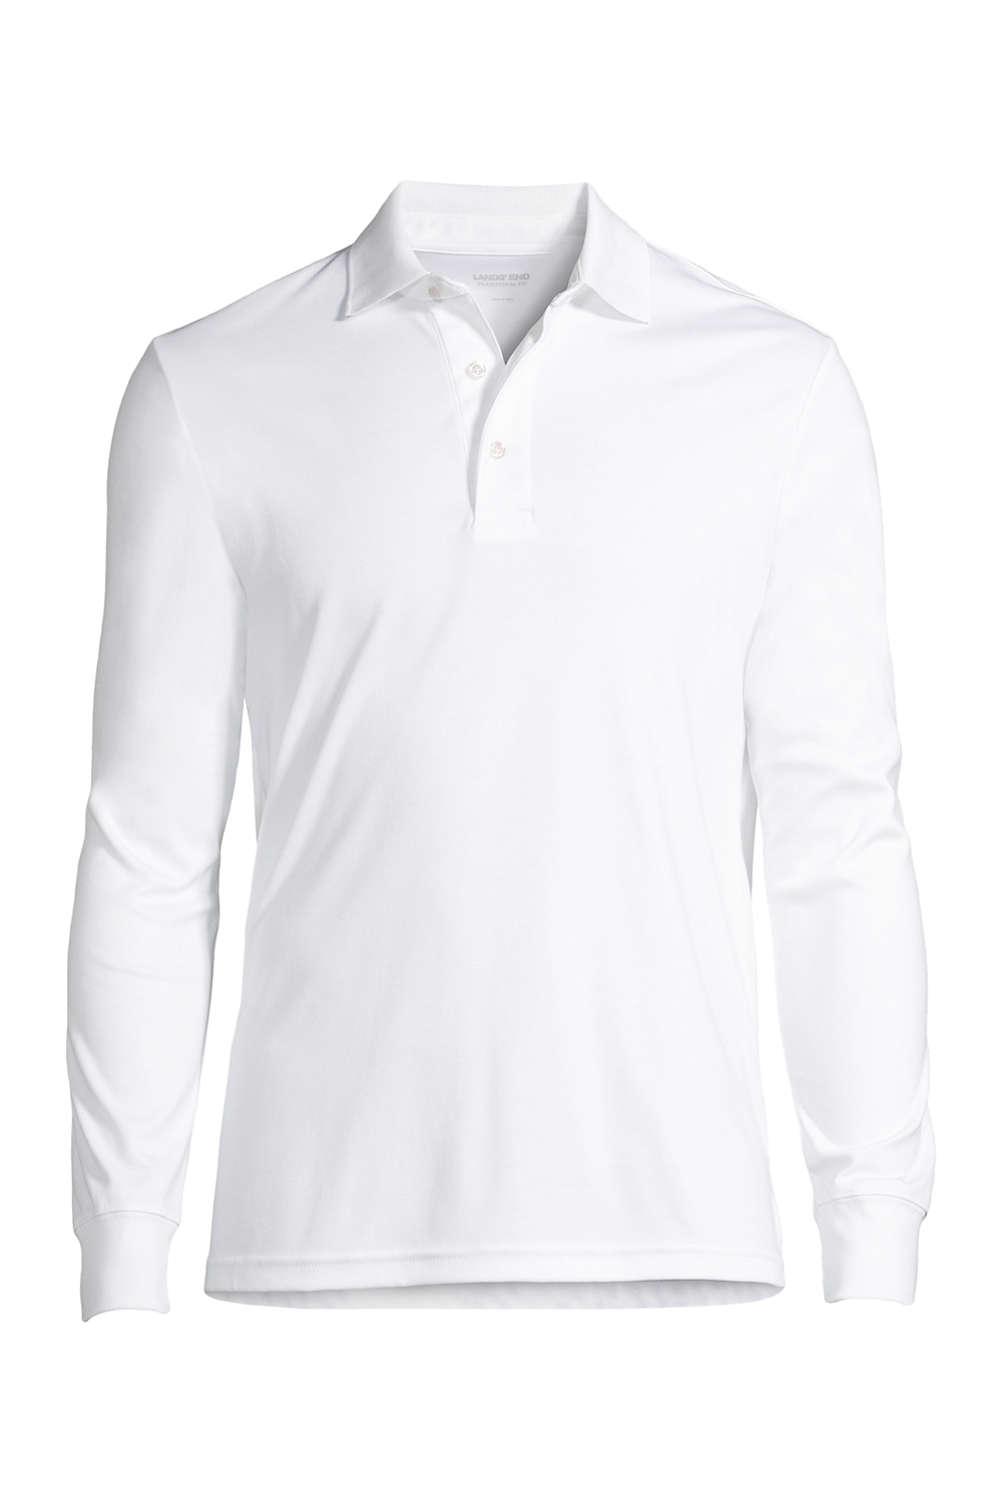 ad648c798f5 Men's Big & Tall Long Sleeve Supima Interlock Polo Shirt